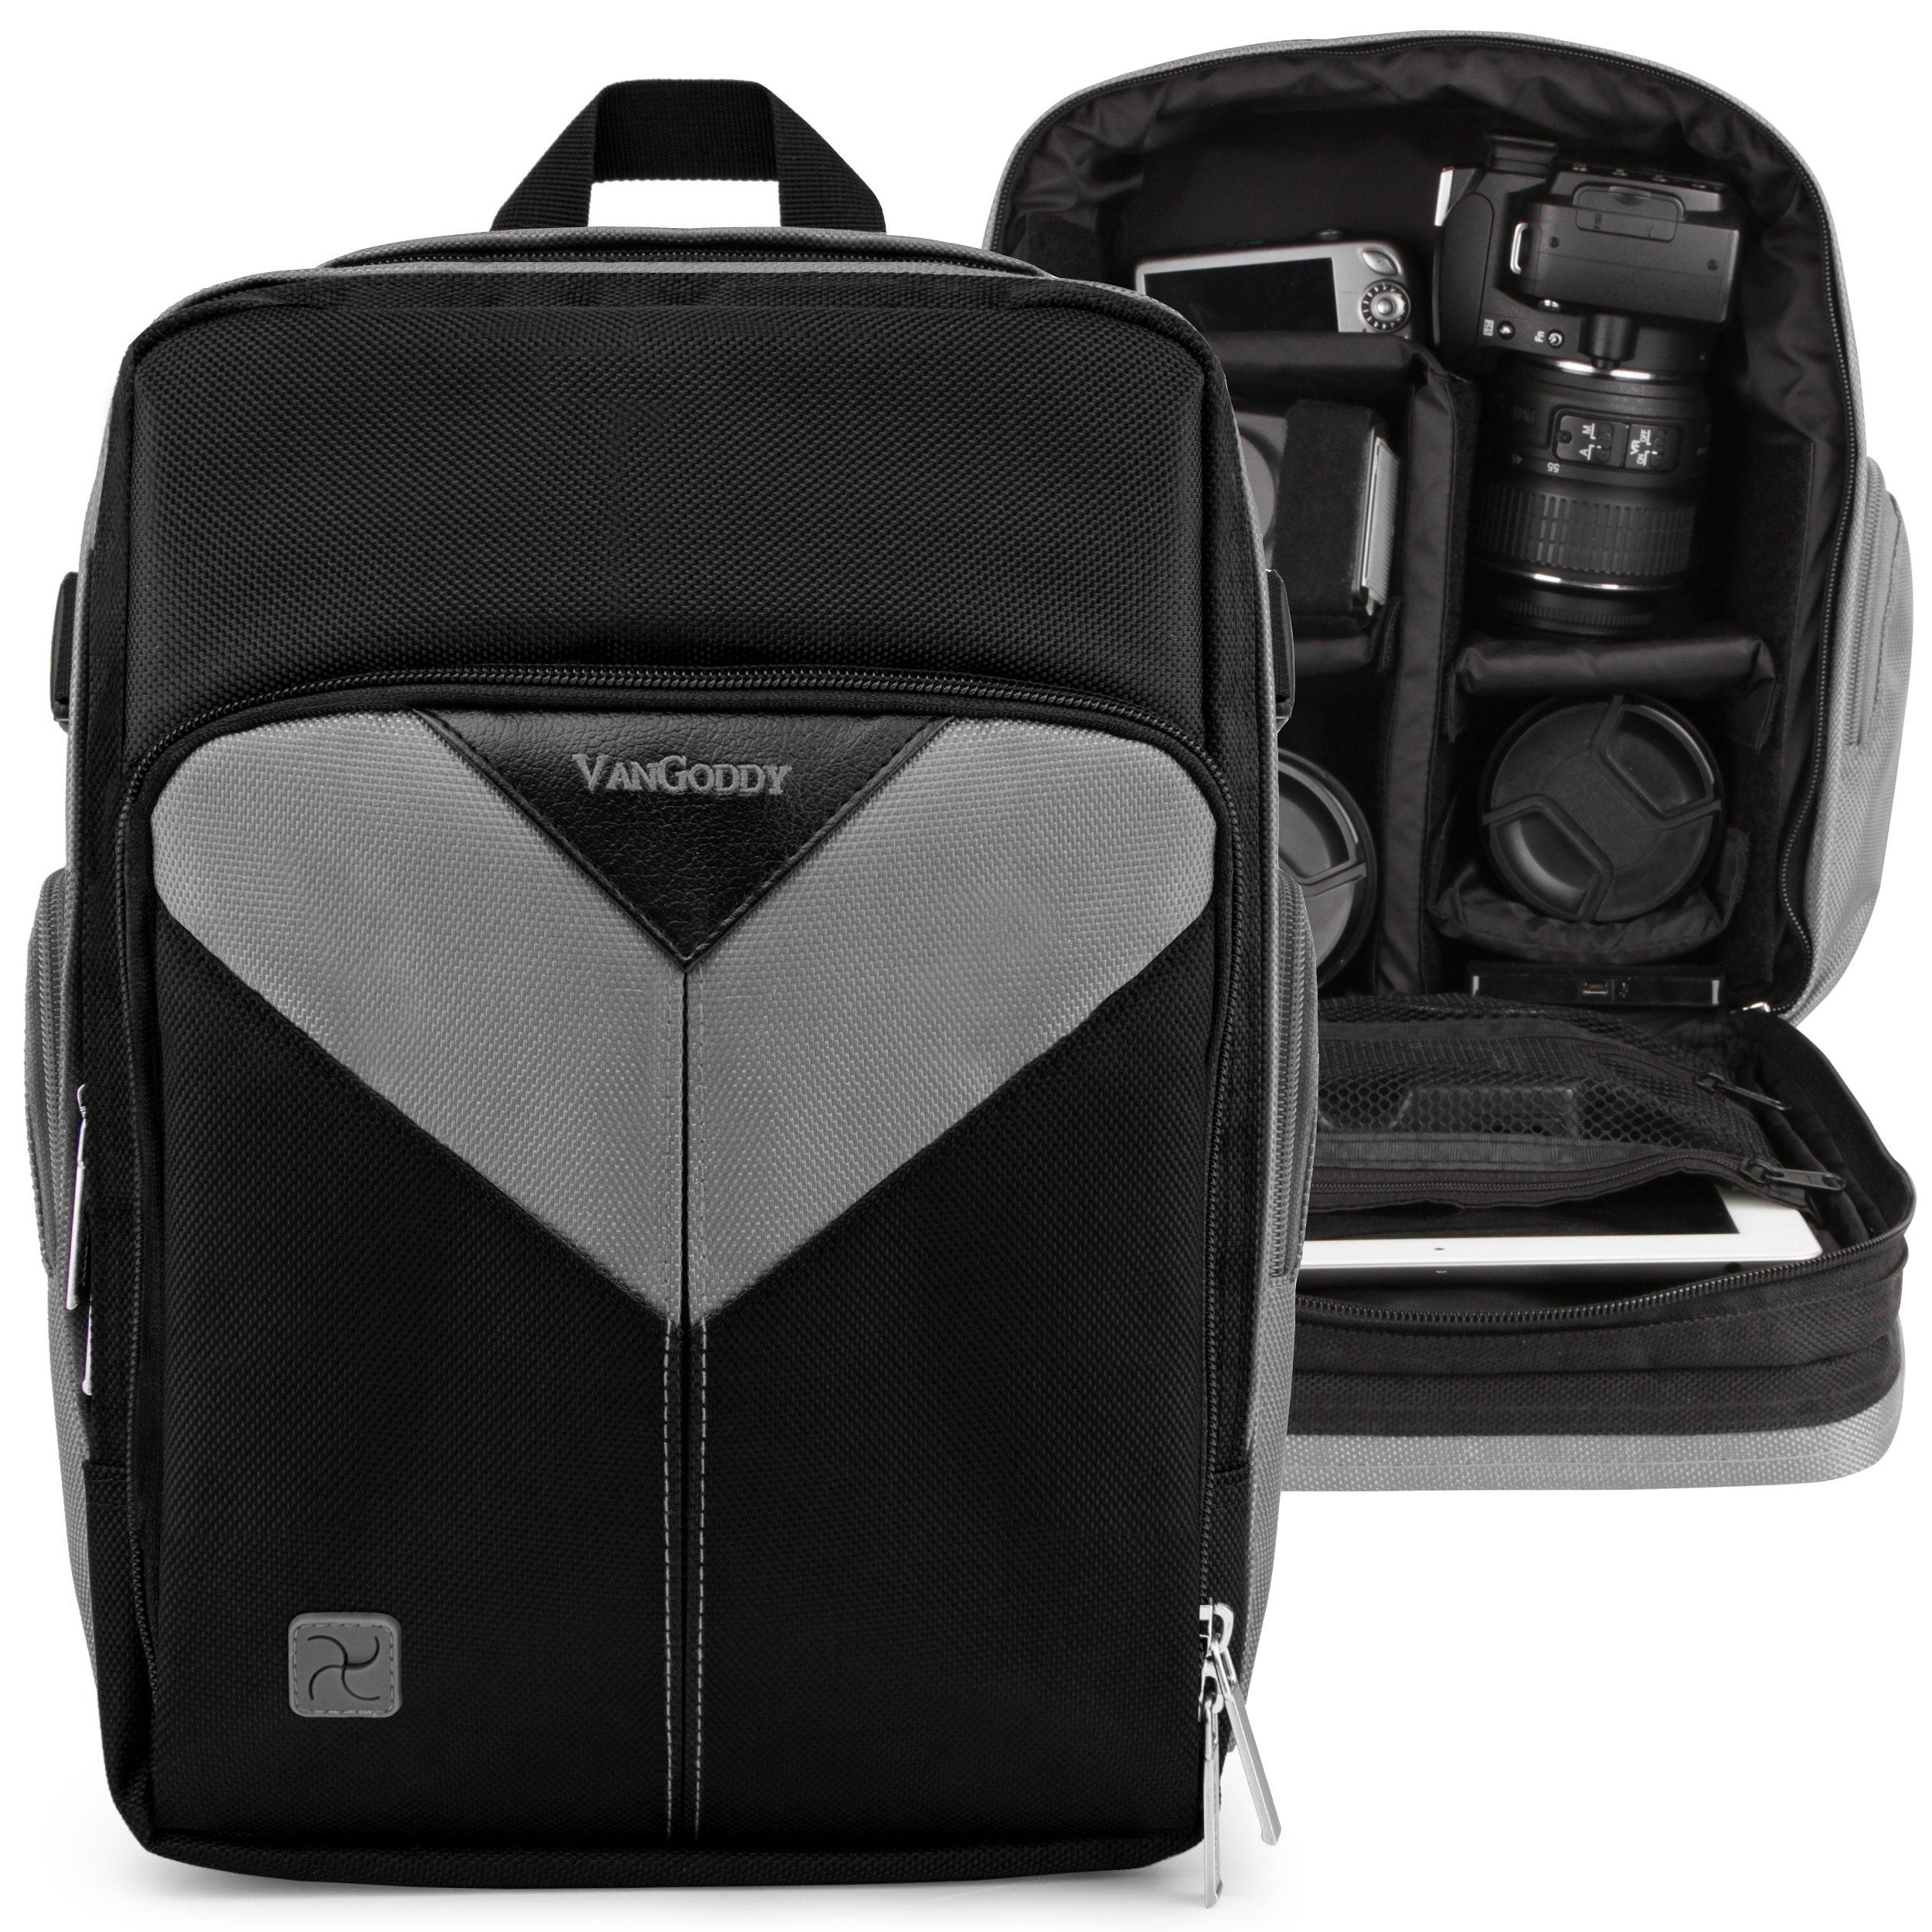 VanGoddy Sparta Ash Gray Camera Backpack Suitable for Canon XA11, XA15, XA10, XA35, XA30, XA20, XC15, XC10, XF400, XF405, XF205, XF200, XF105, XF100, VIXA HF G20, G40, G21, GX10